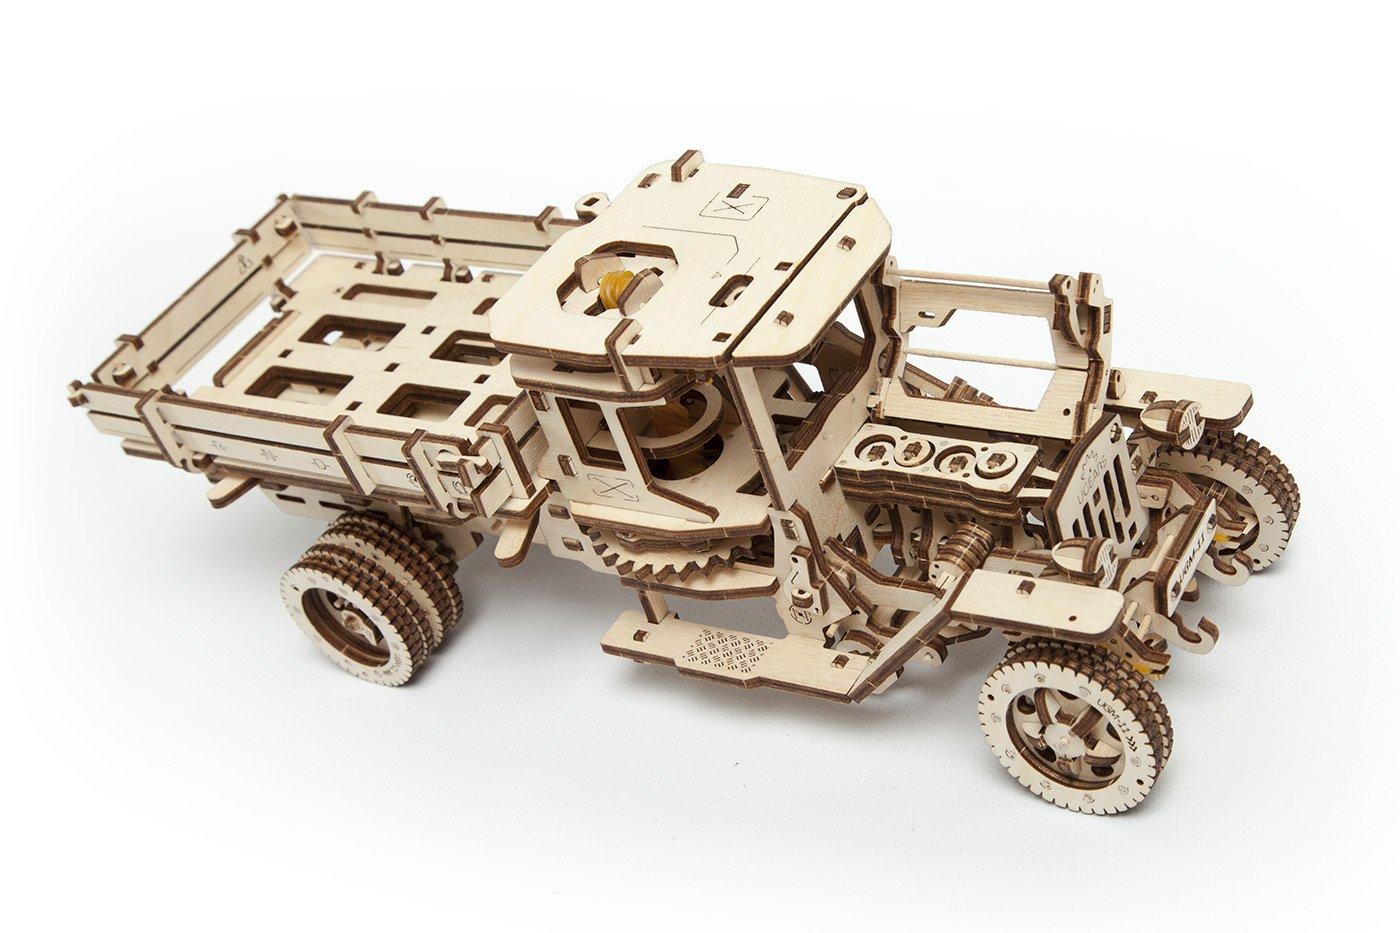 S.T.E.A.M. Line Toys UGears Mechanical Models 3-D Wooden Puzzle - Mechanical 11 Truck 1920's Model T 5